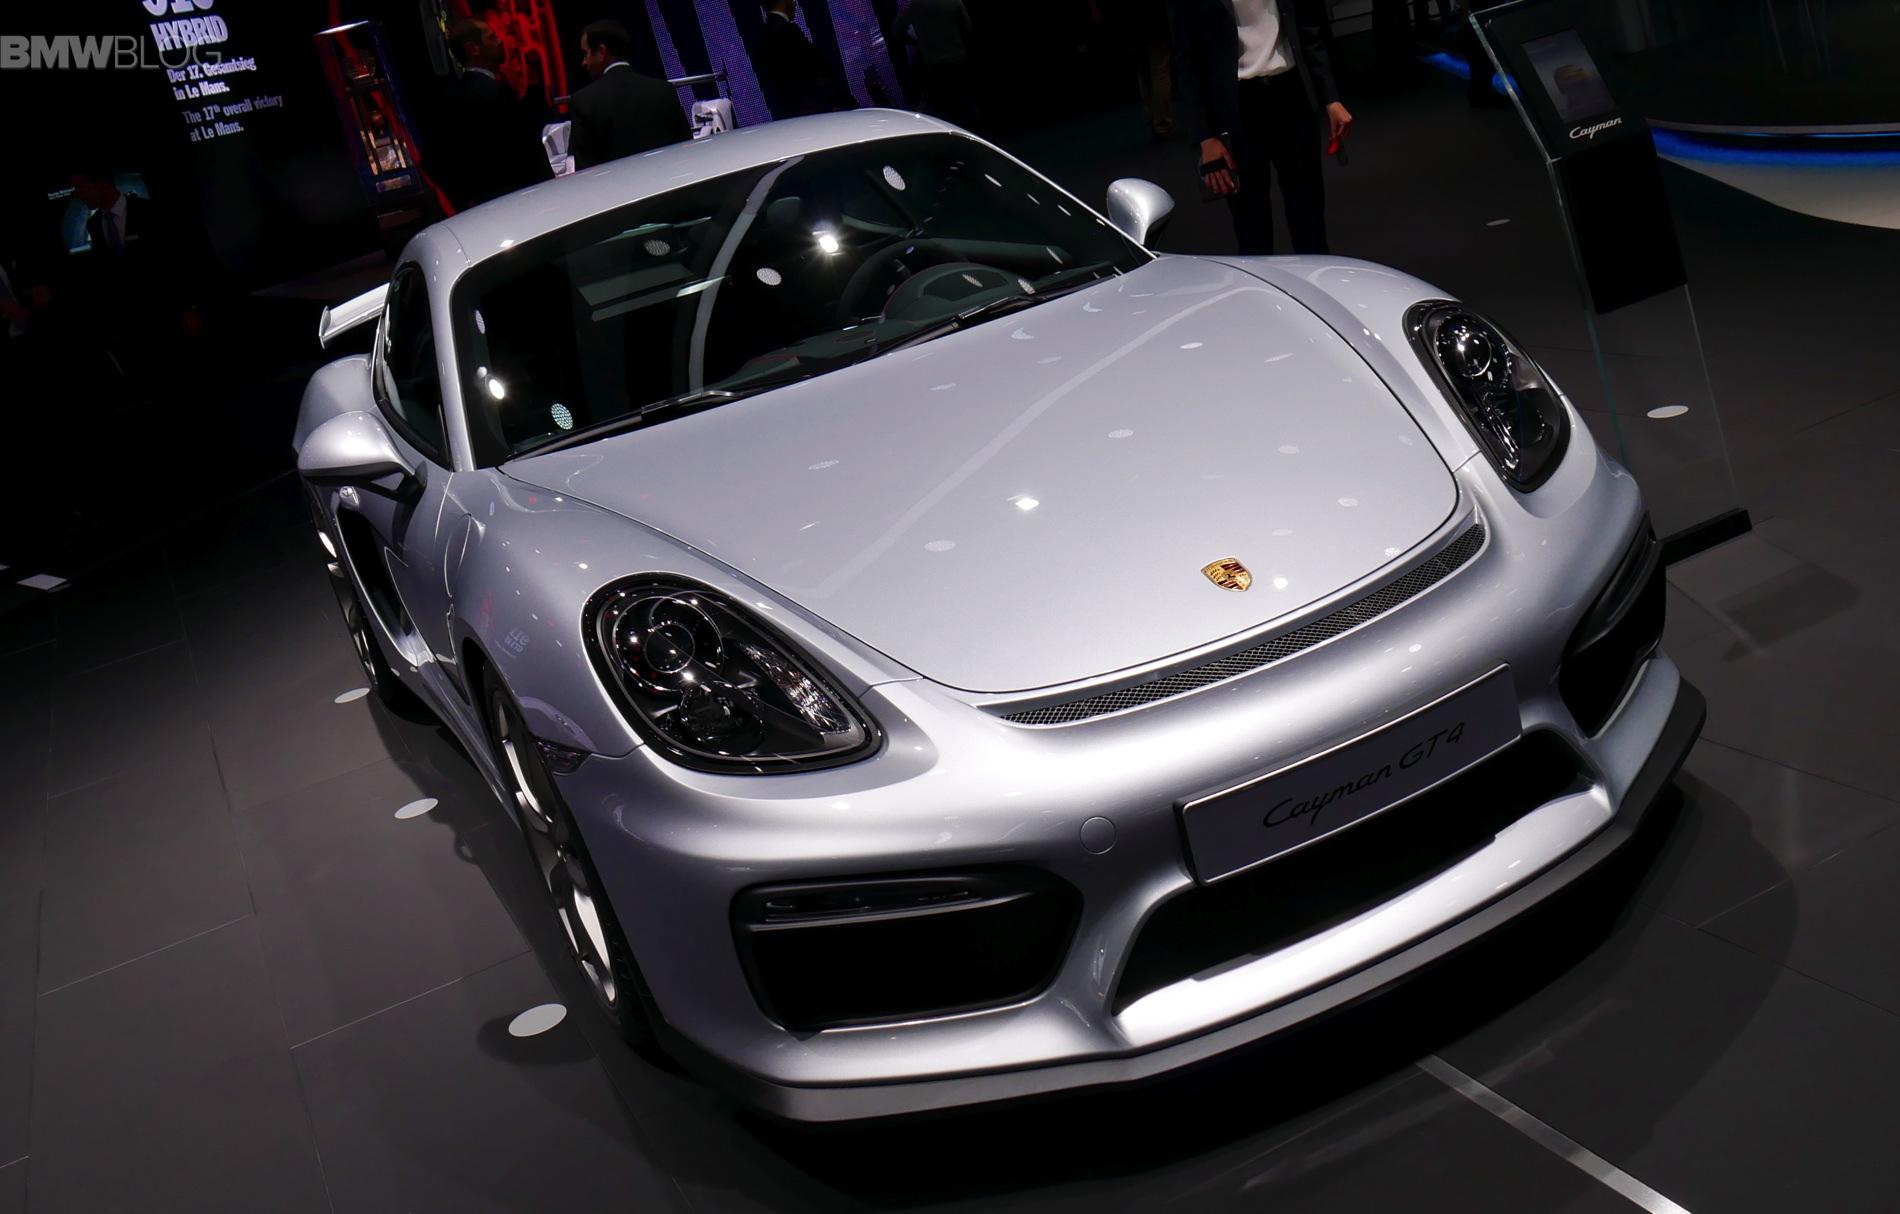 2016 Porsche Cayman GT4 images 01